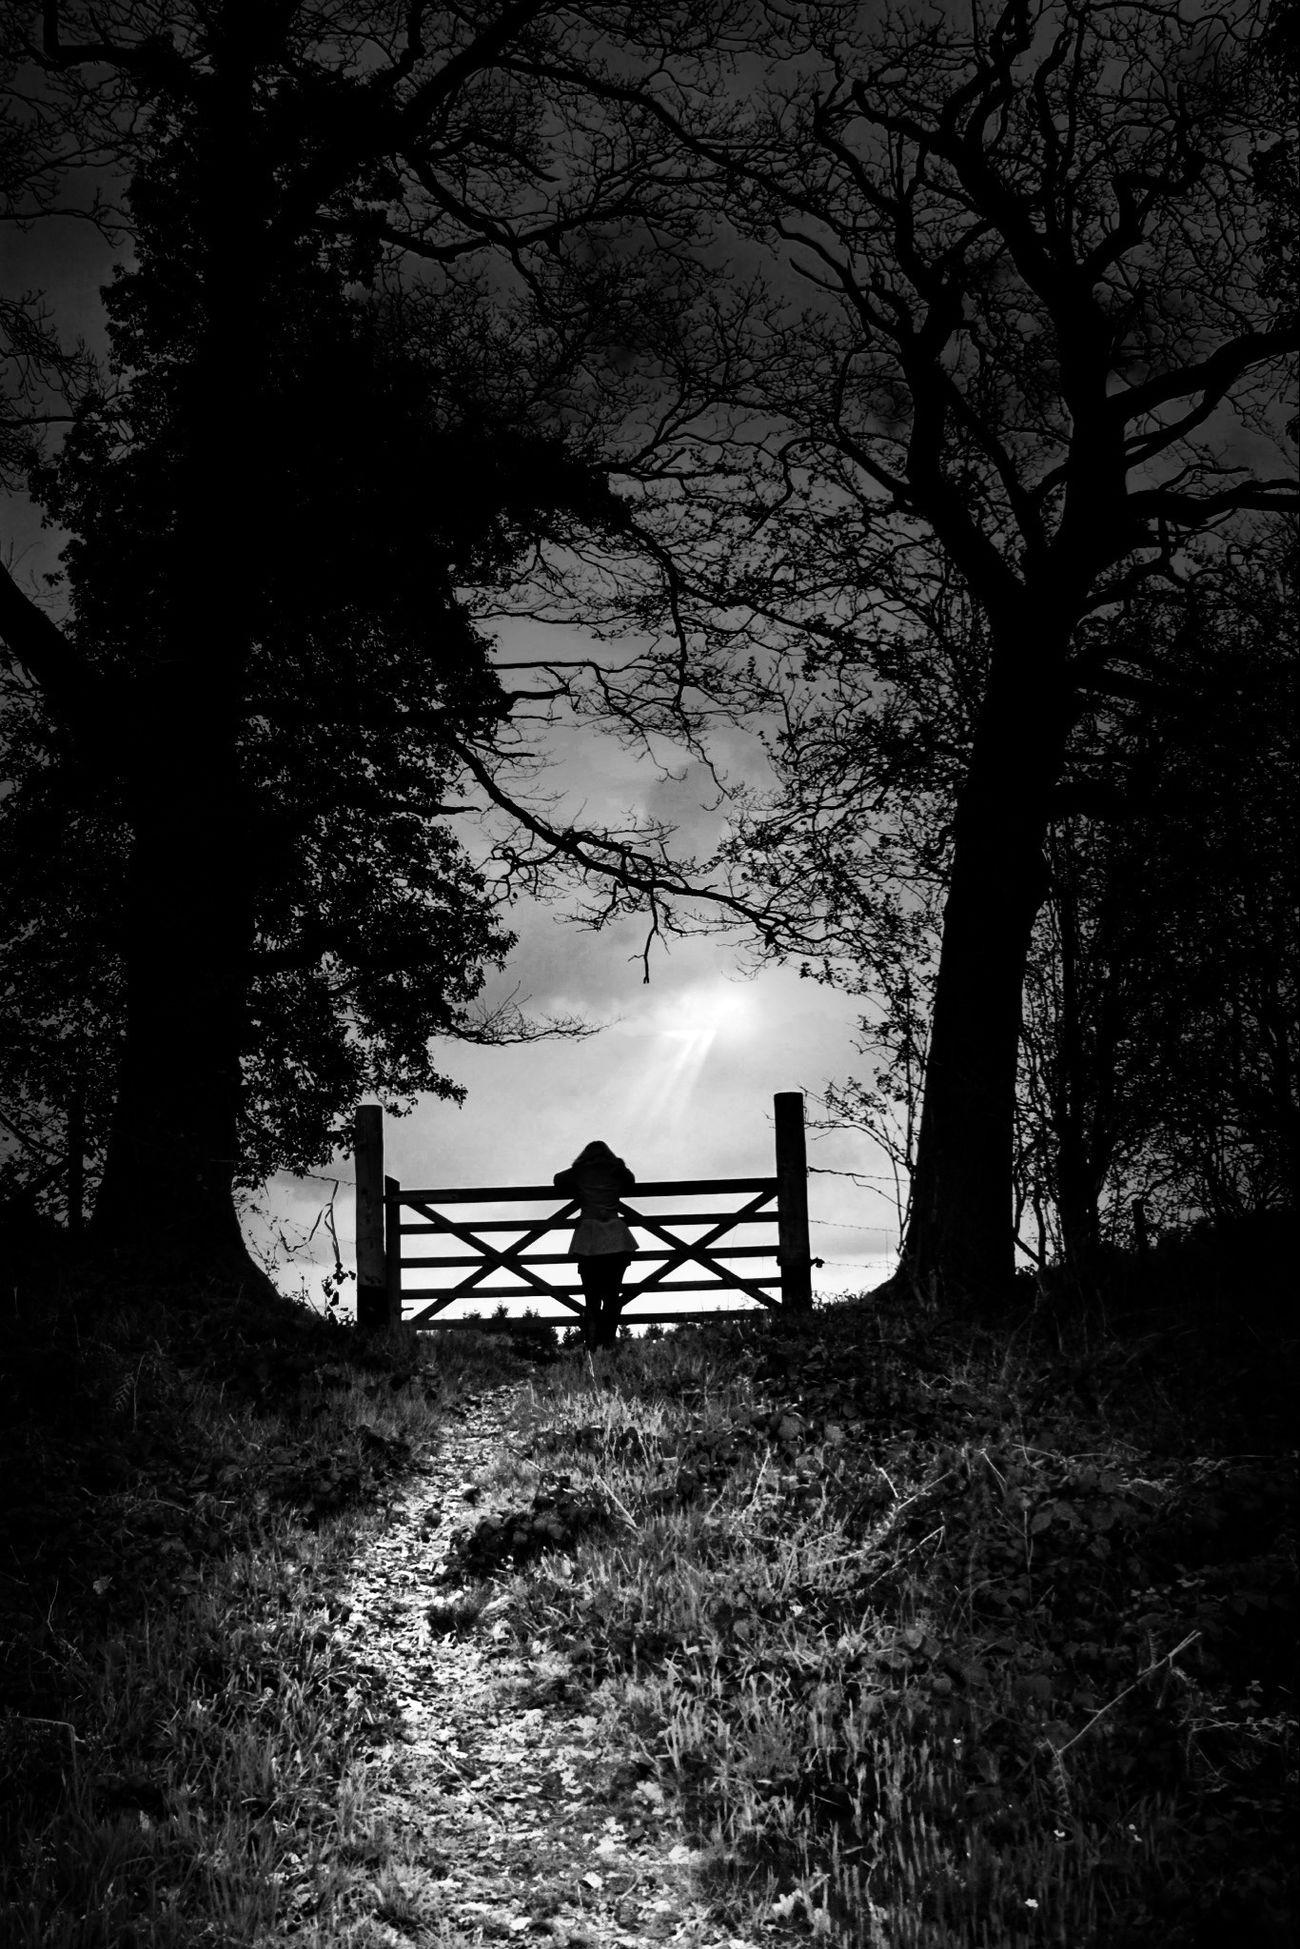 Path Blackandwhite Landscape Light Eye4photography  Monochrome Shootermag Sadness Tracks